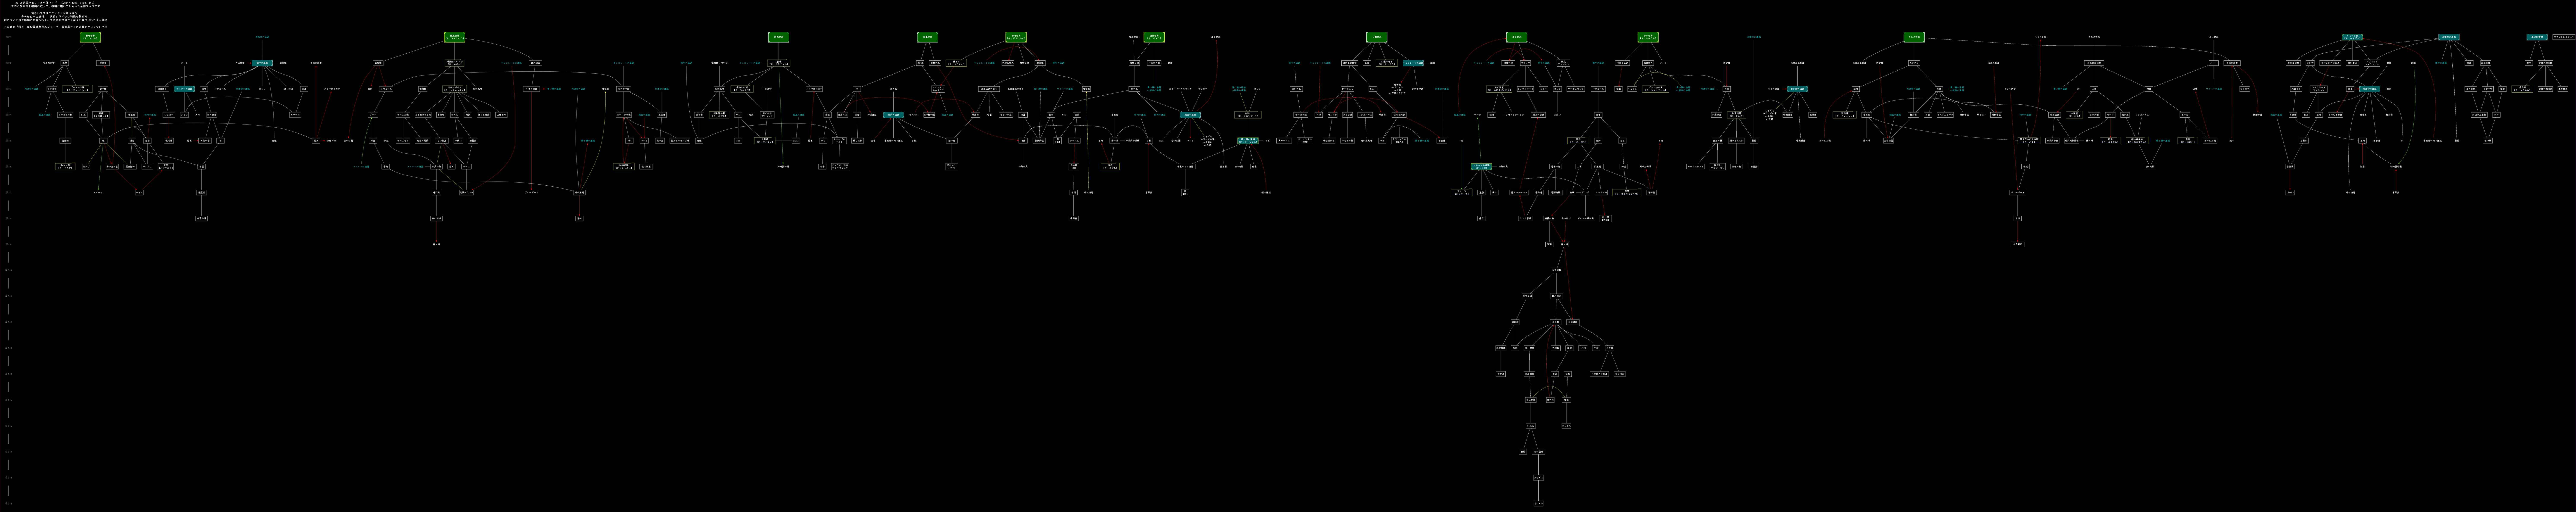 yume2kki_map_DOT_ver0105h.jpg